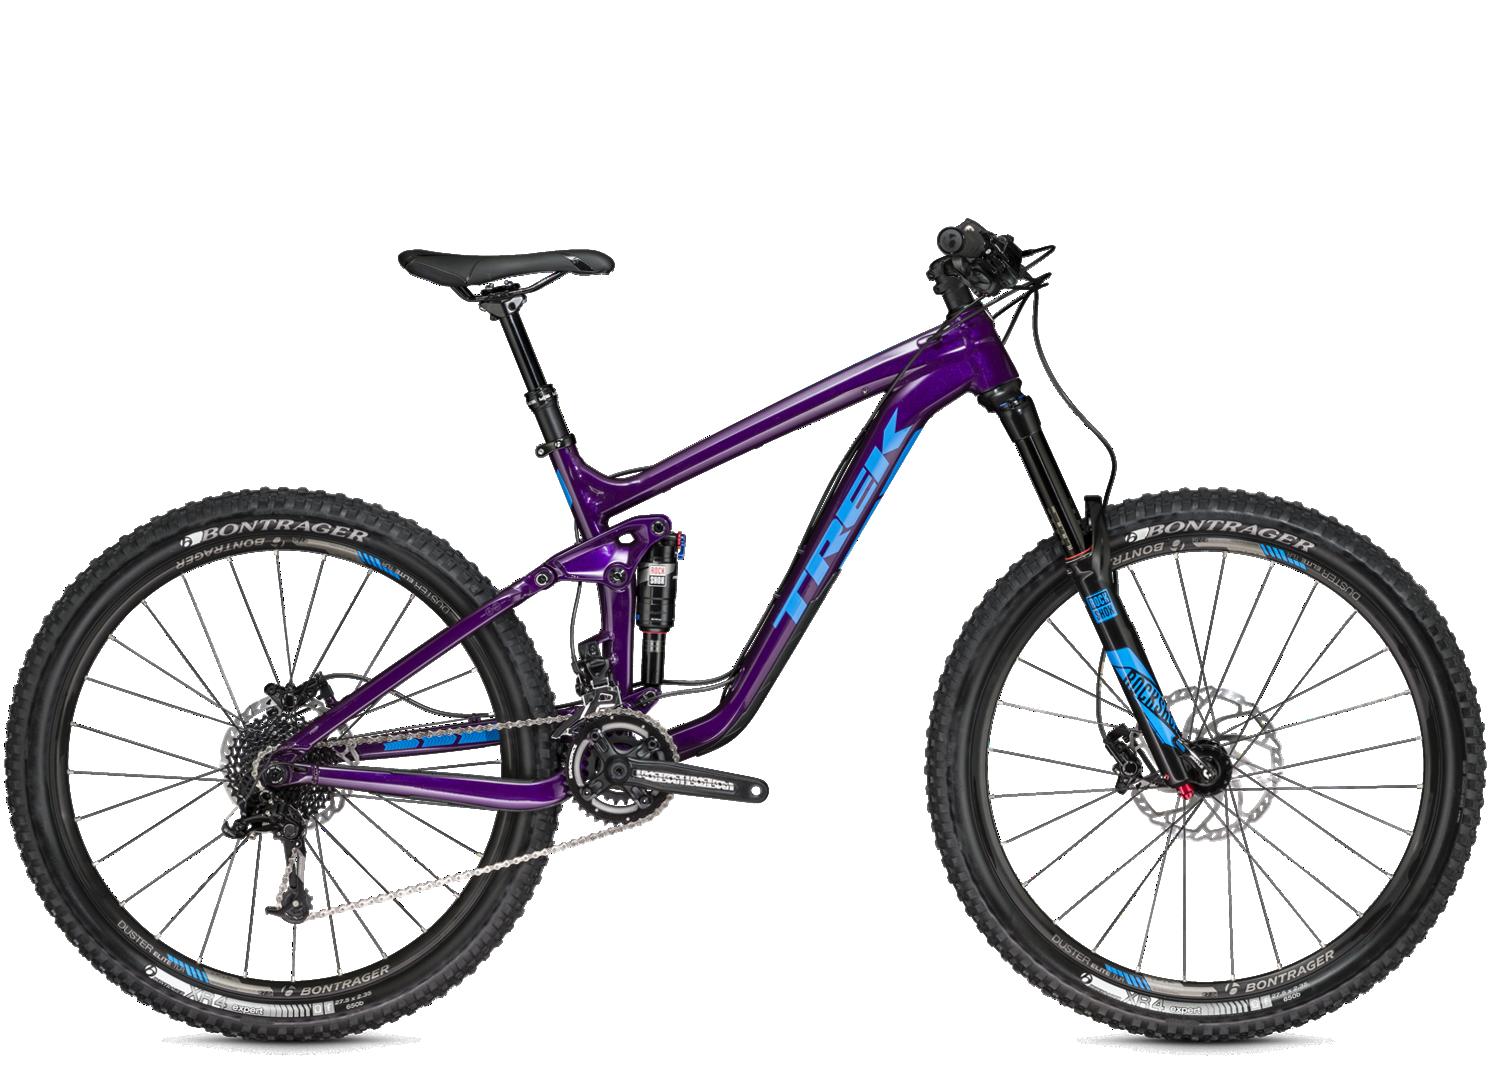 ab52d8e8d6f 2016 Slash 7 27.5 - Bike Archive - Trek Bicycle